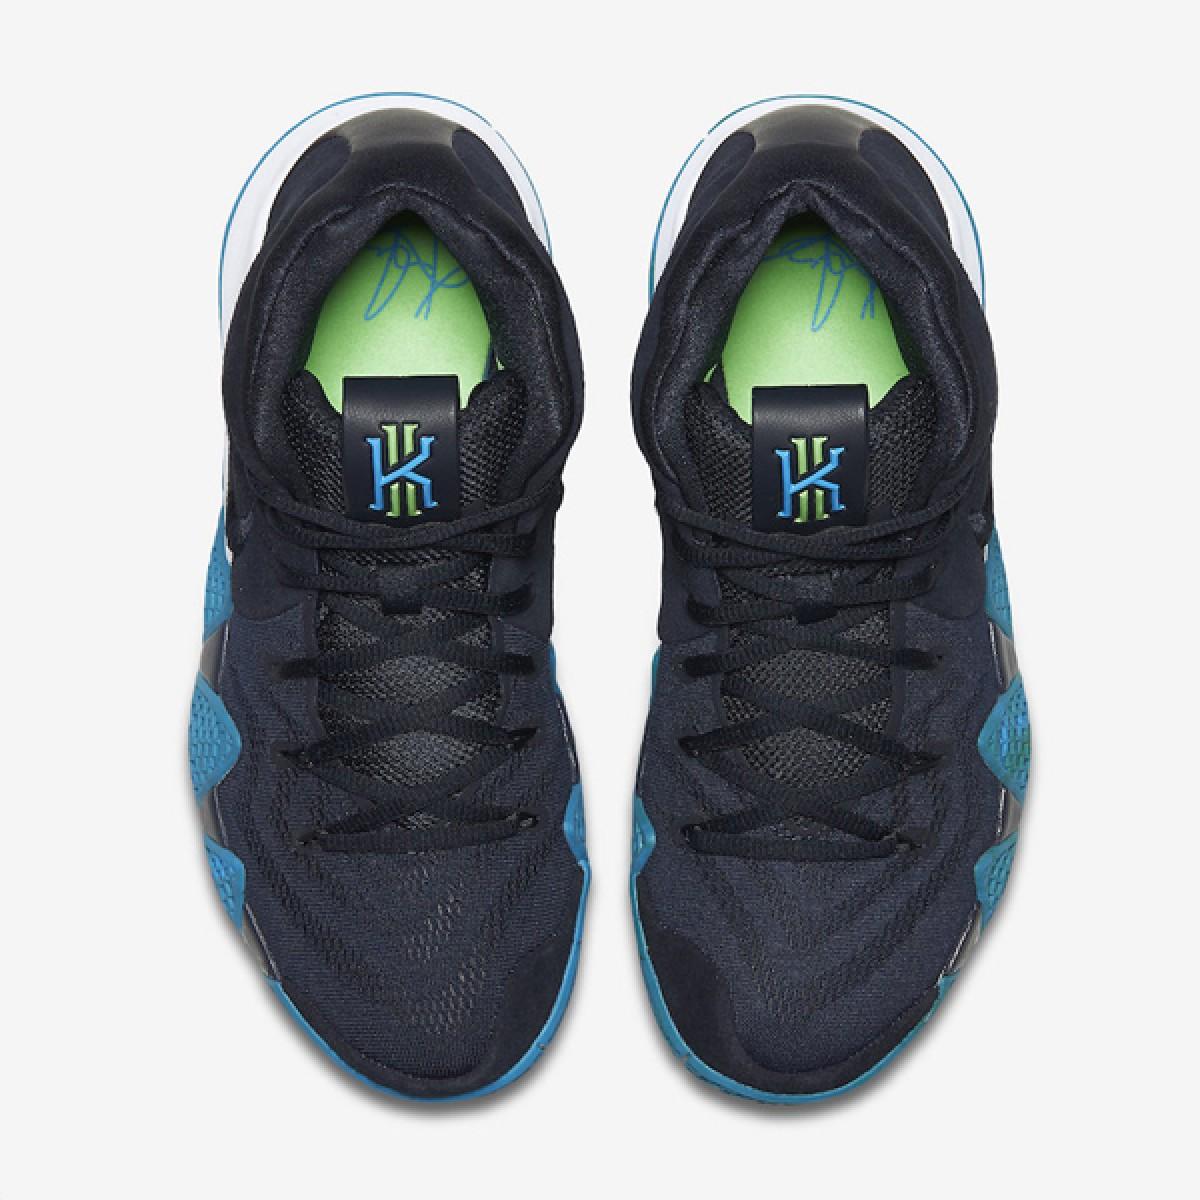 Nike Kyrie 4 GS 'Obsidian' AA2897-401